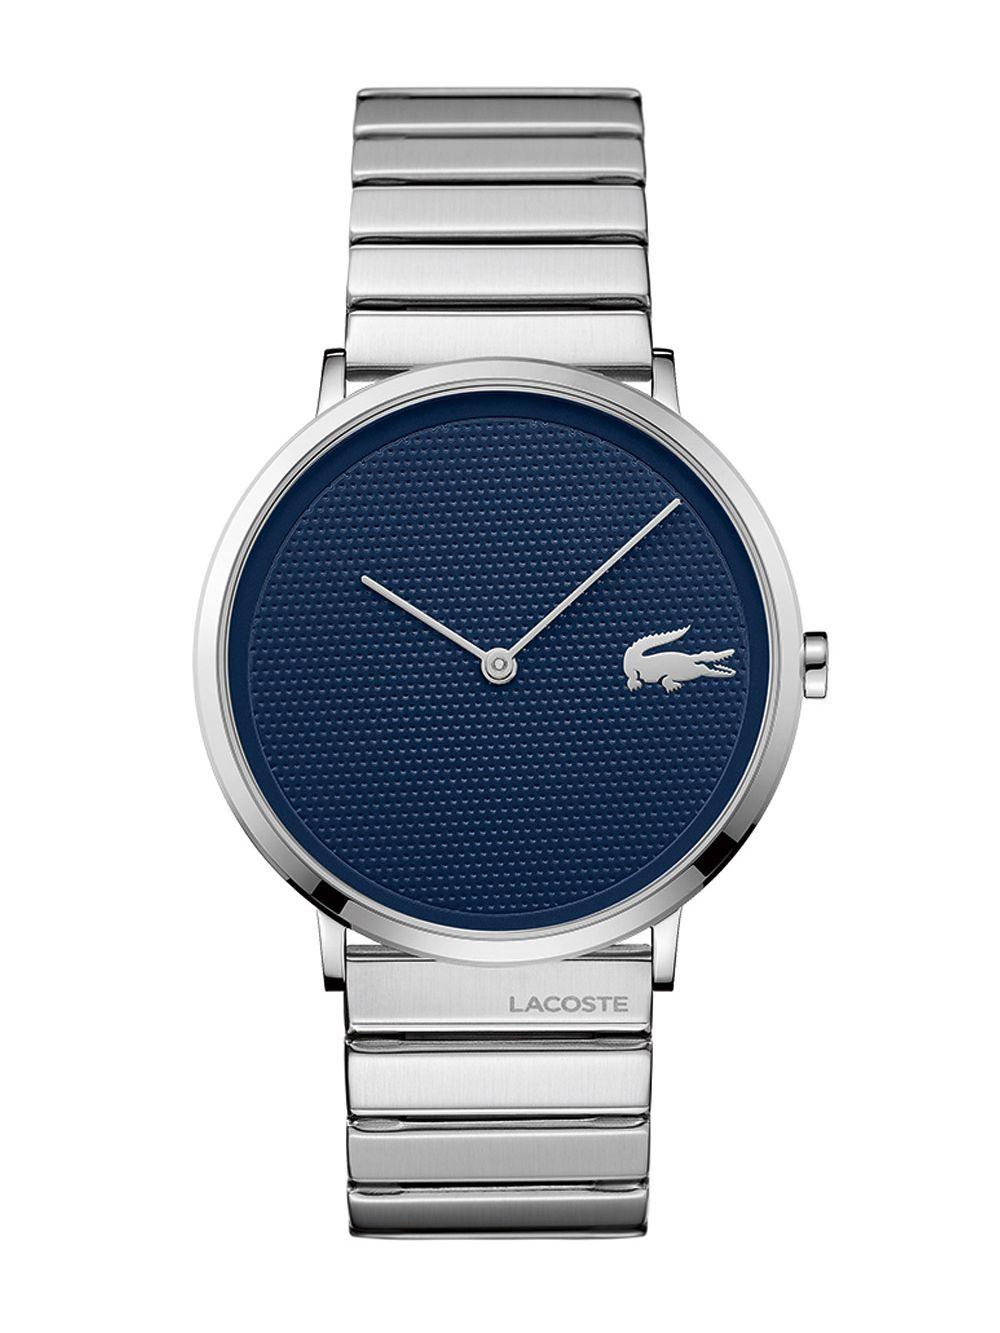 b1fbf8a8dba LACOSTE Mens Watch Moon 2010953 • uhrcenter Watches Shop